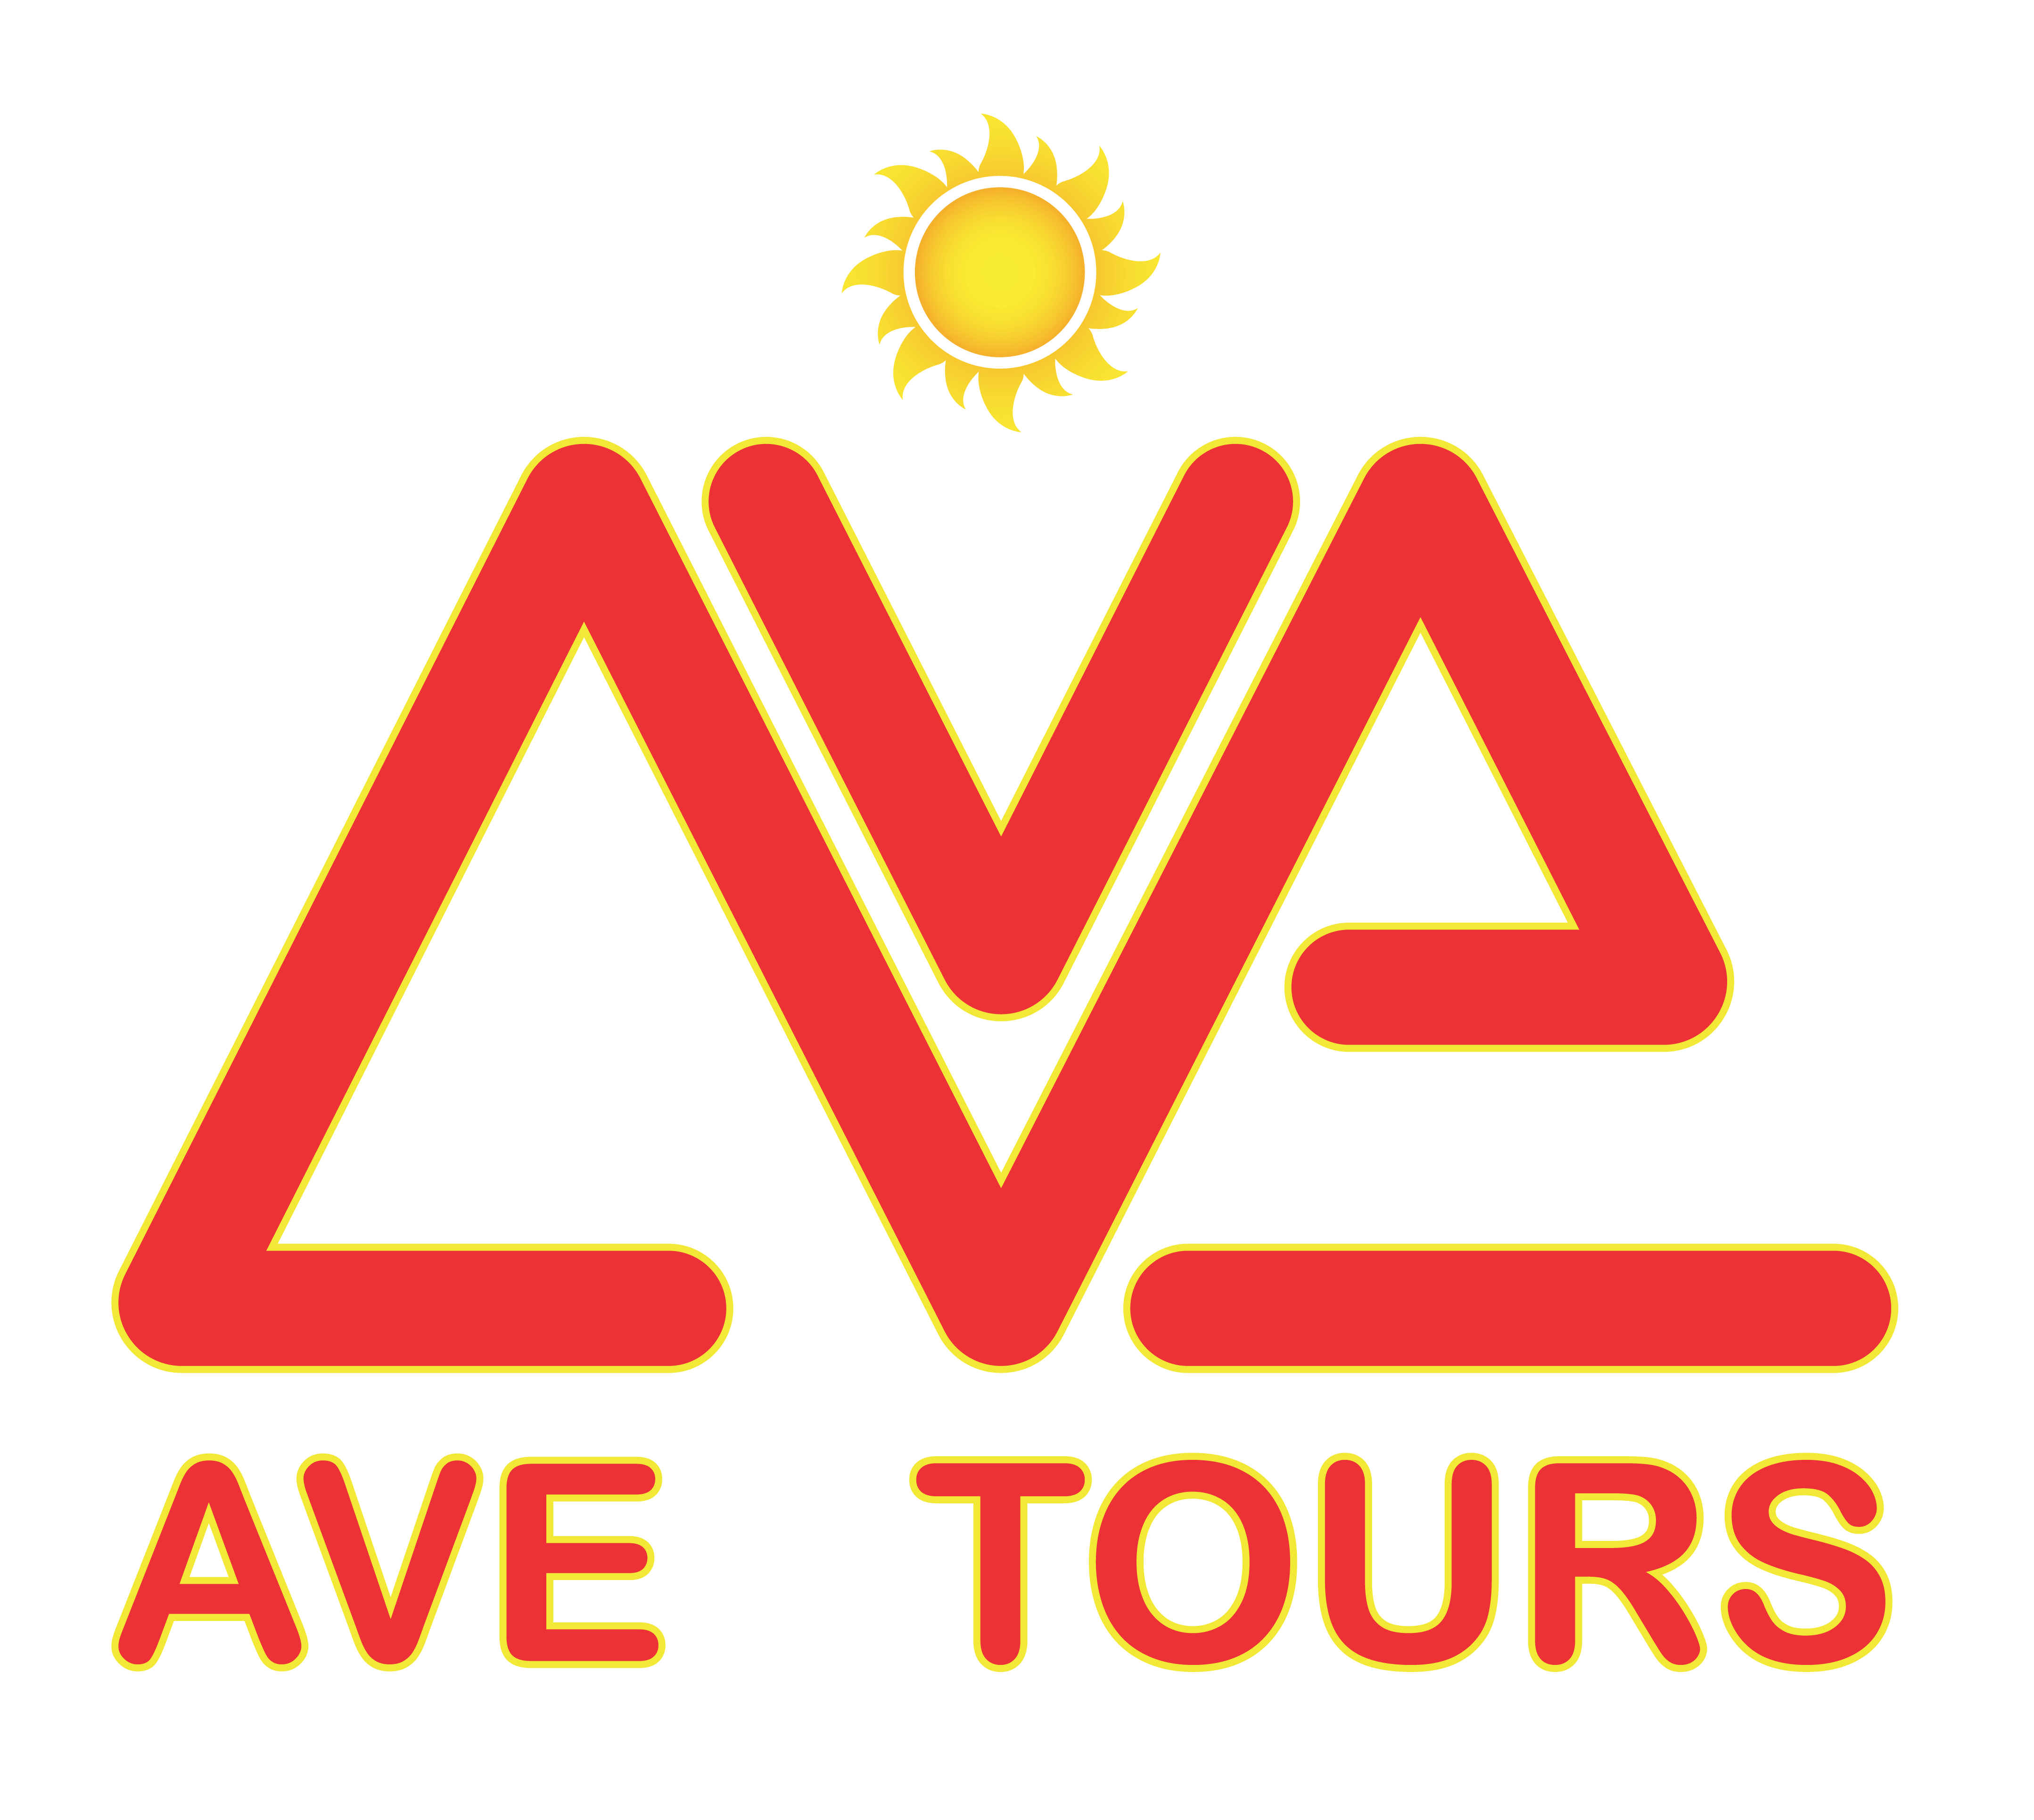 Ave Tours Montenegro